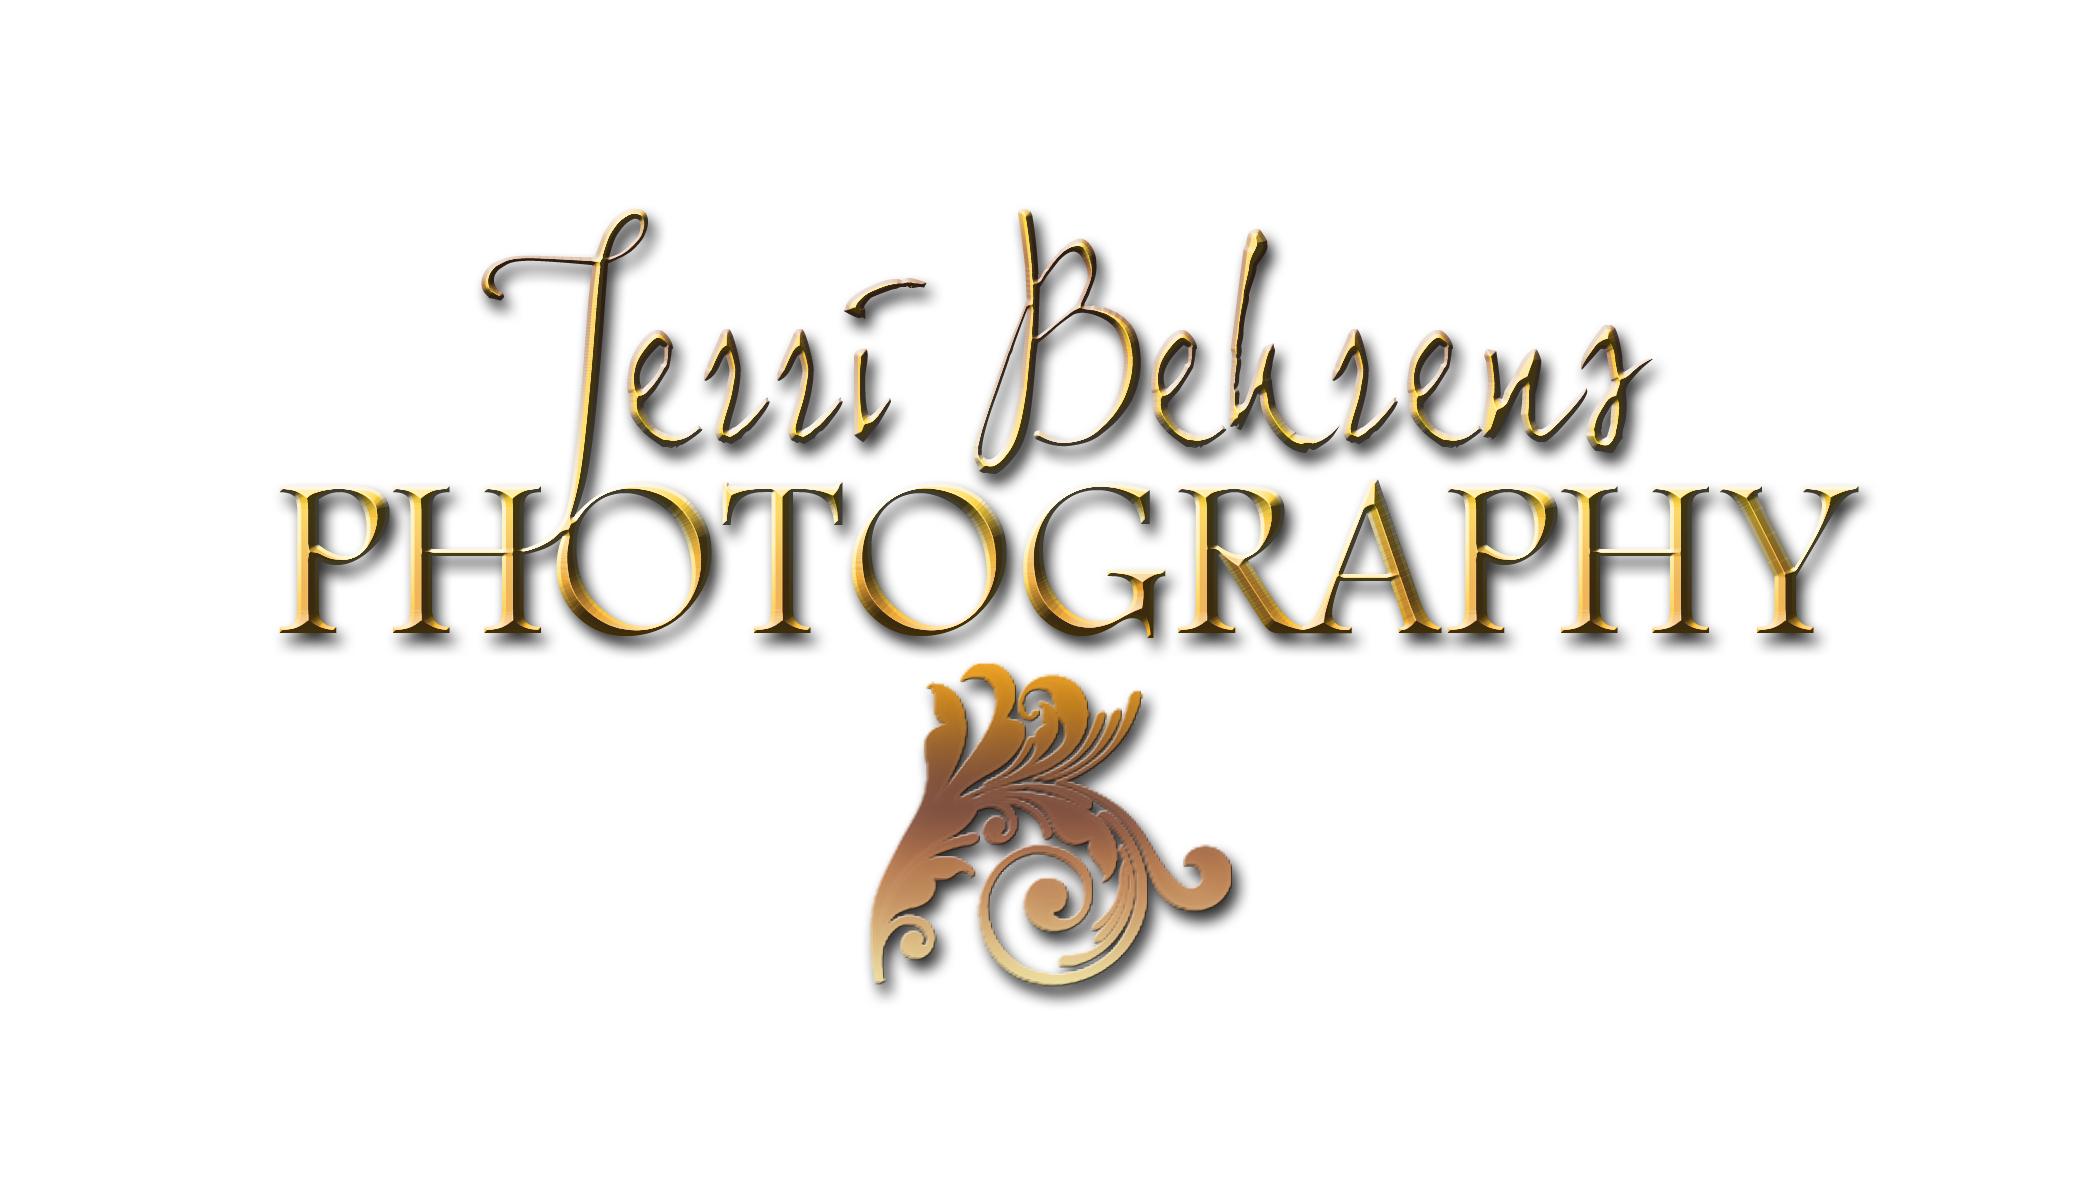 Terri Behrens Photography